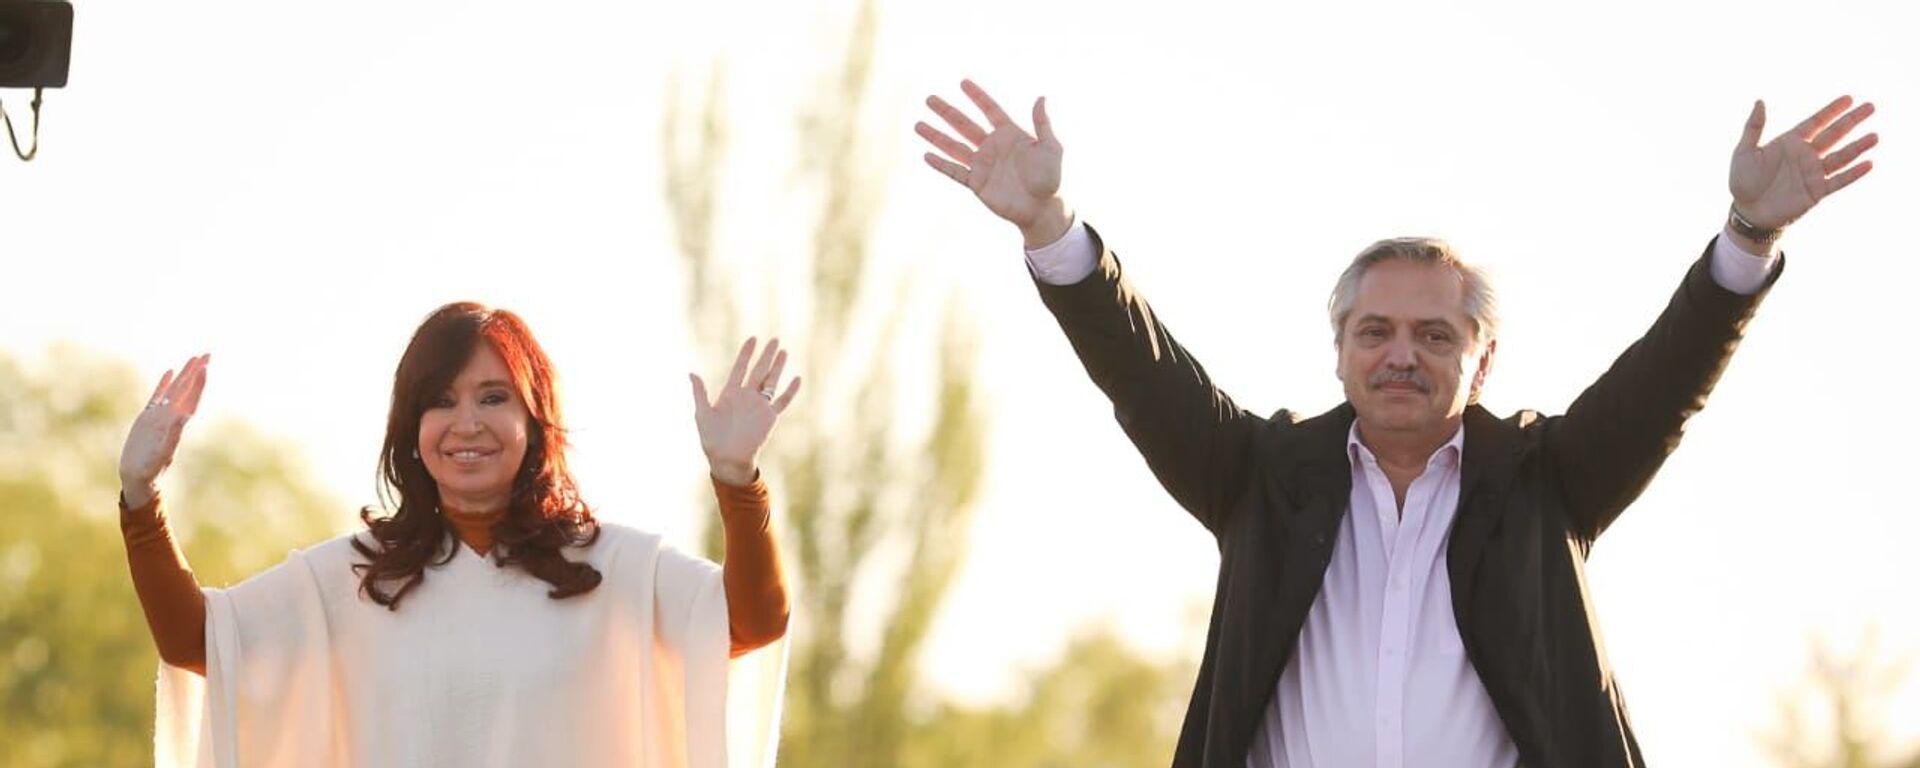 Cristina Fernández y Alberto Fernández - Sputnik Mundo, 1920, 17.09.2021